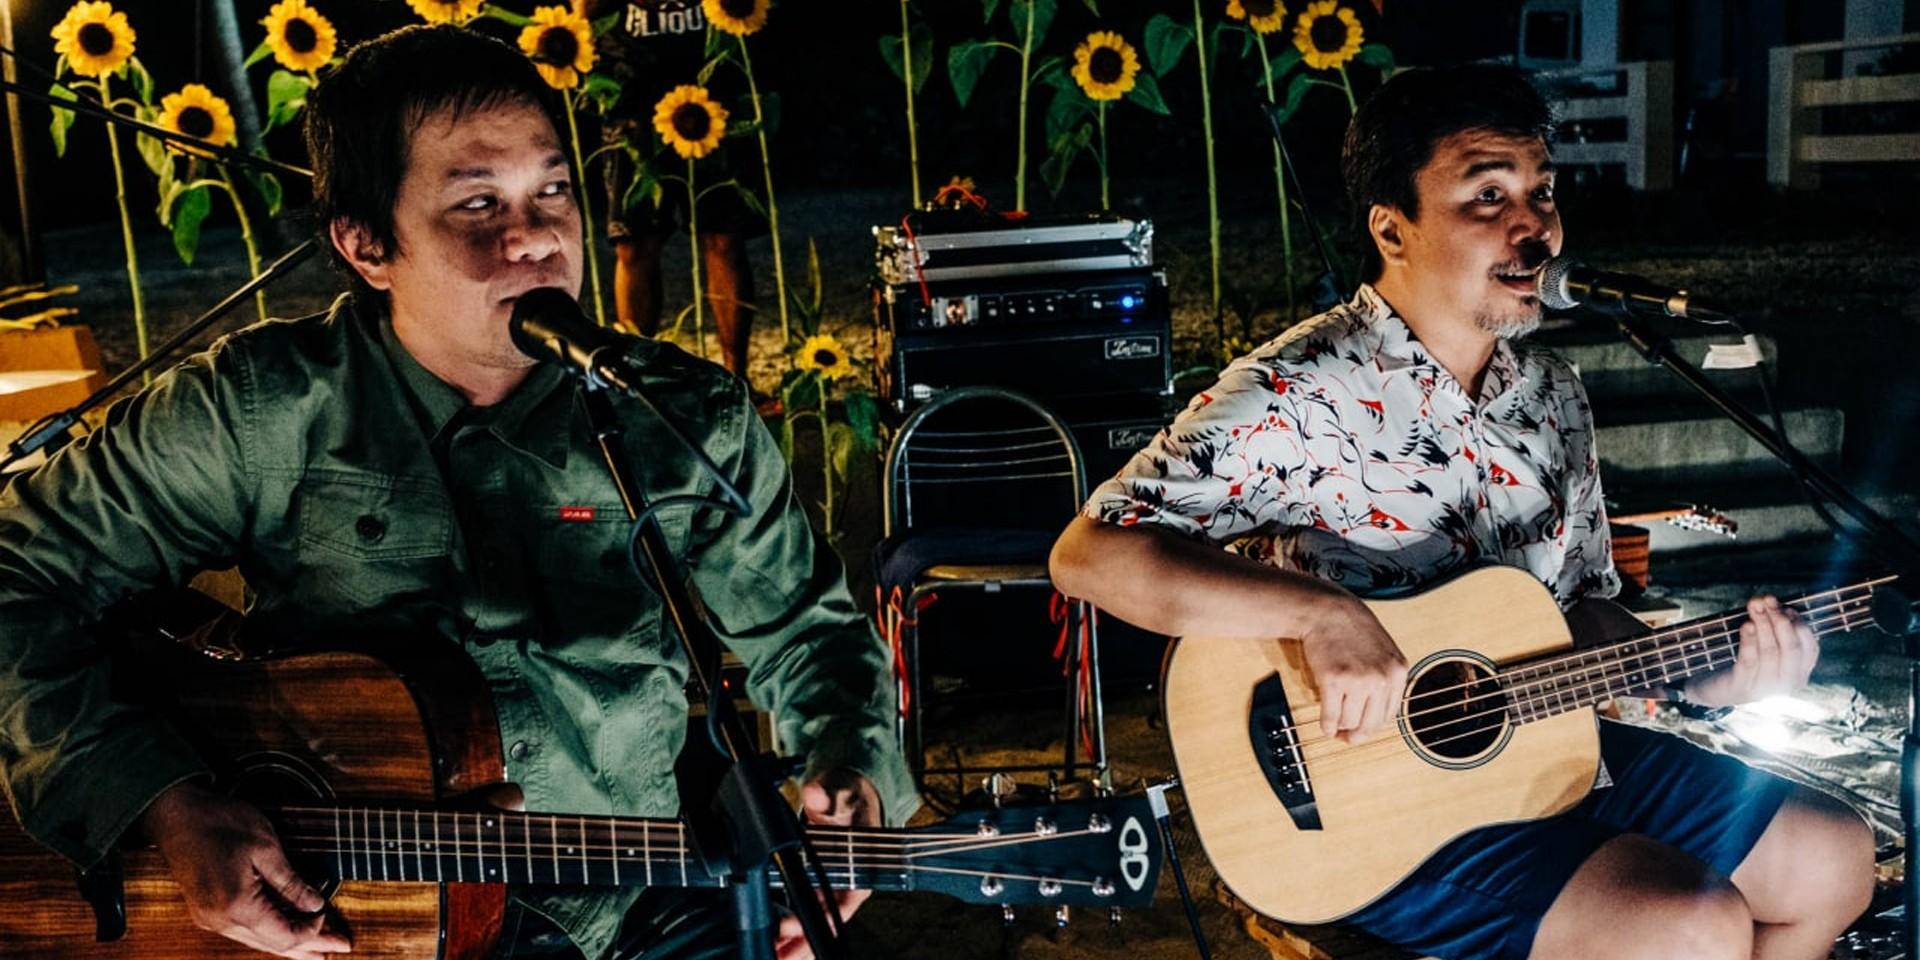 Ultracombo's Raymund Marasigan and Buddy Zabala, Basti Artadi, Cooky Chua to perform at Legends Only virtual concert